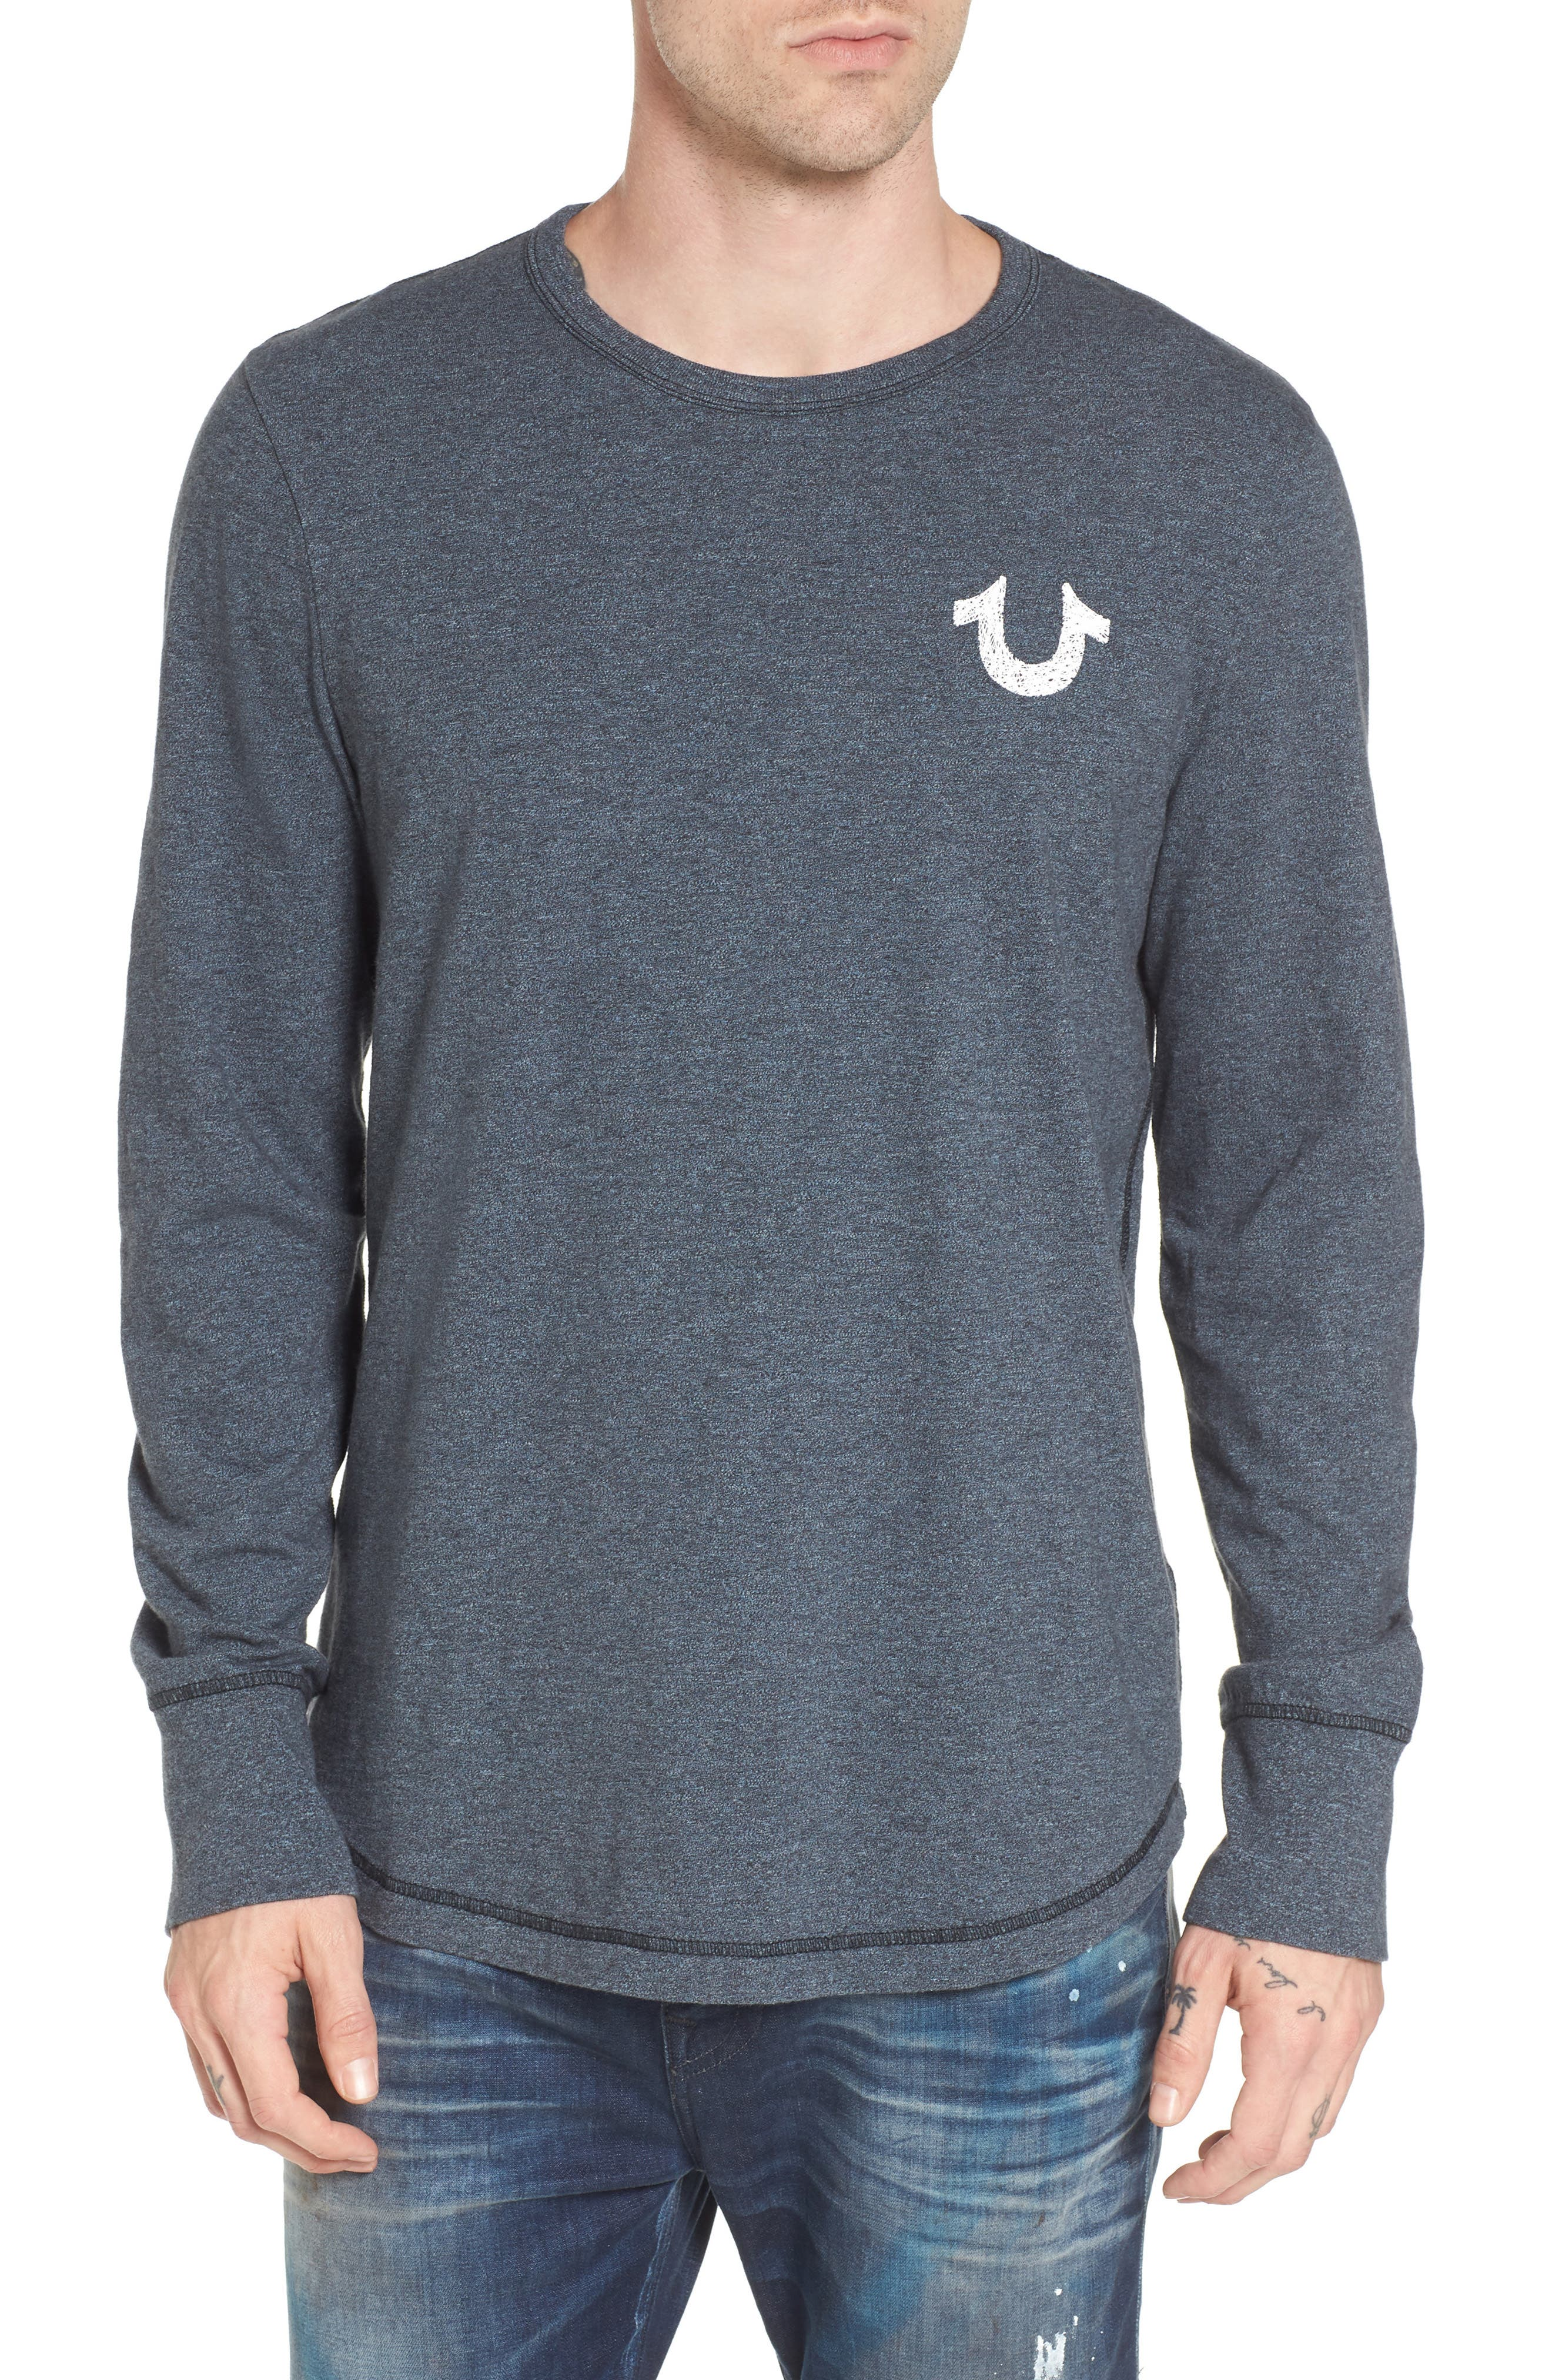 True Religion Brand Jeans Logo Graphic T-Shirt